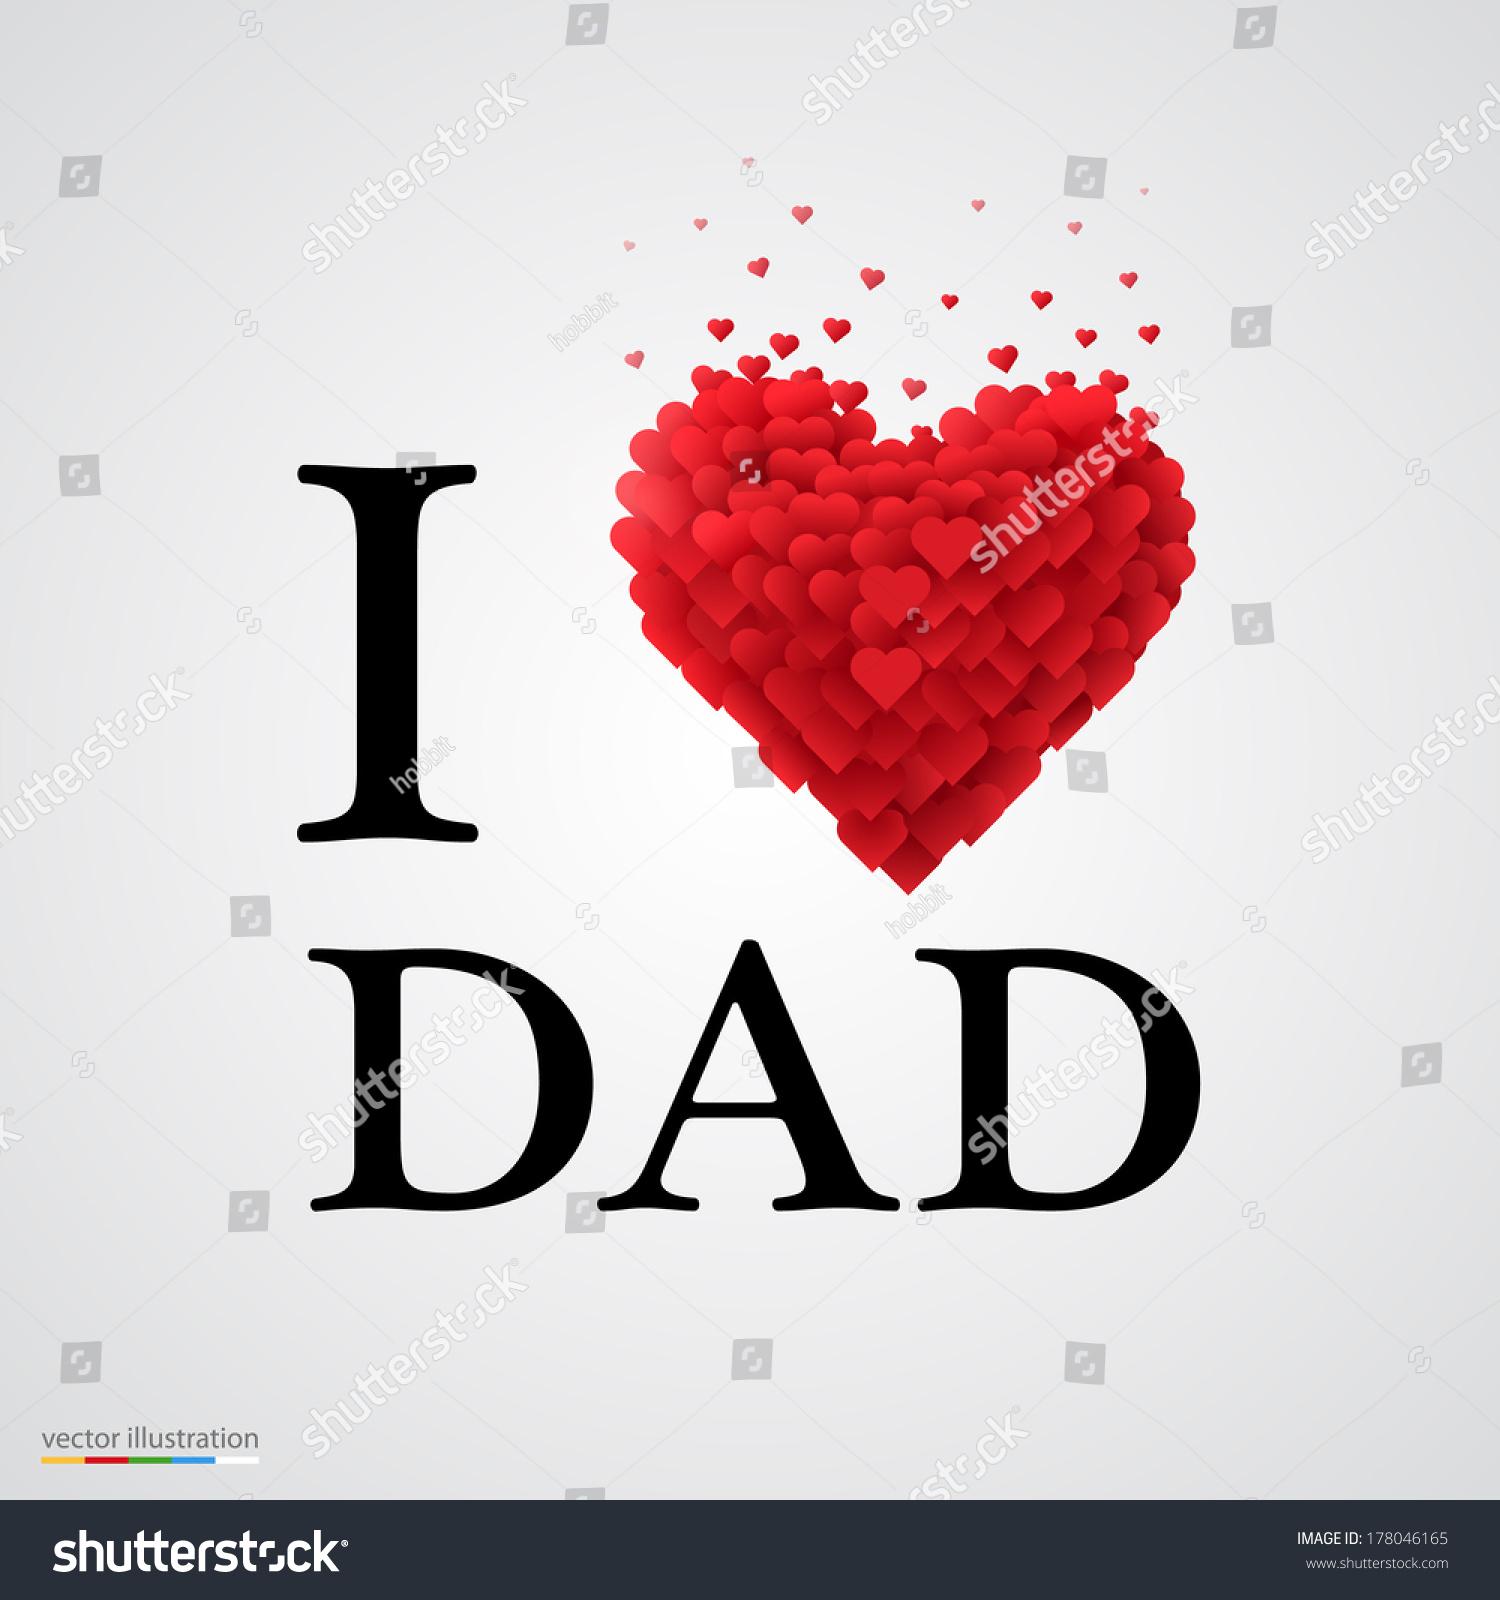 love dad font type heart sign stock vector 178046165 shutterstock. Black Bedroom Furniture Sets. Home Design Ideas